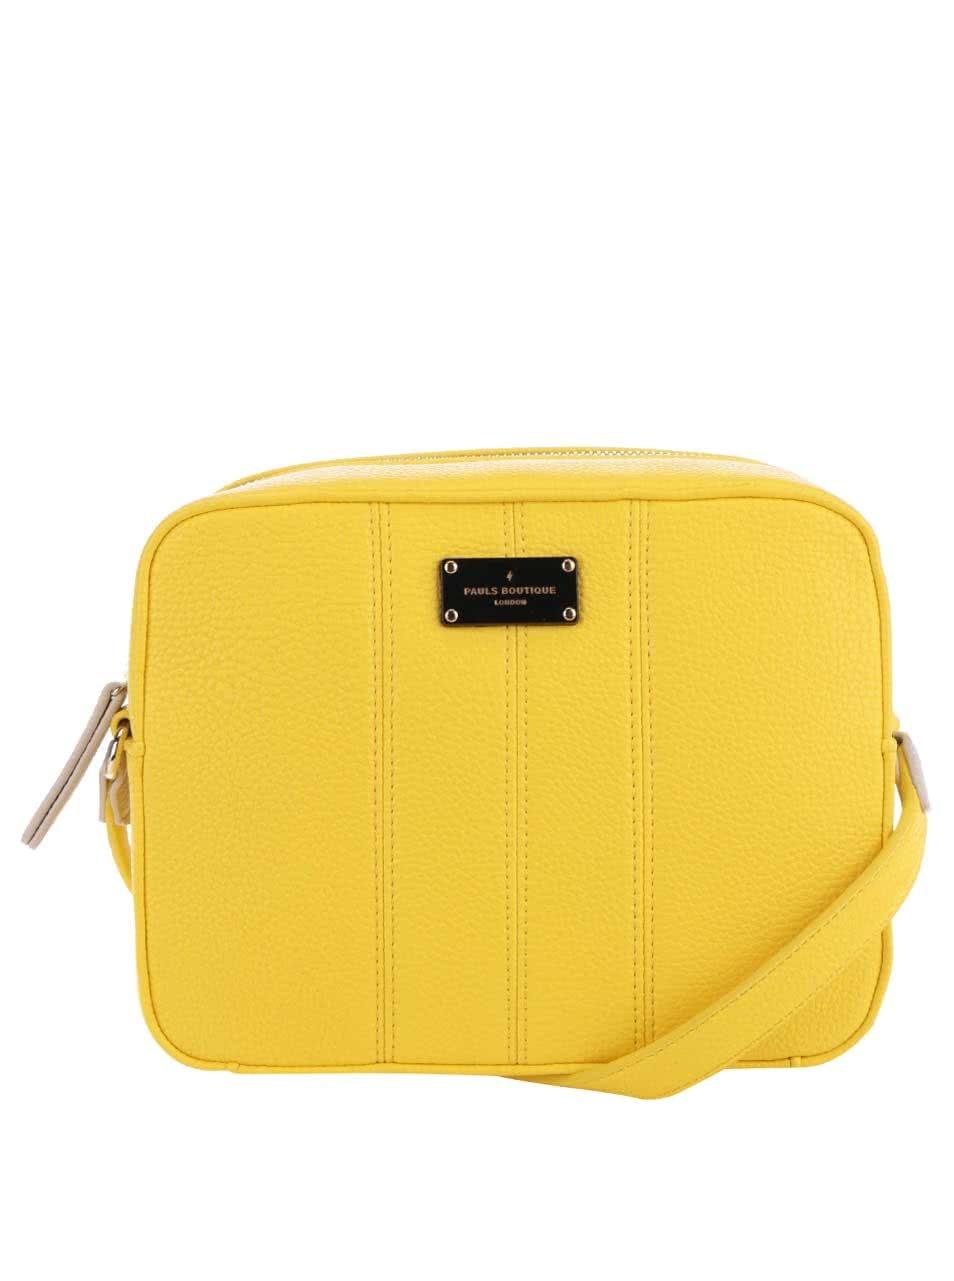 Žltá crossbody kabelka Paul s Boutique Mini ... 44e427c3165